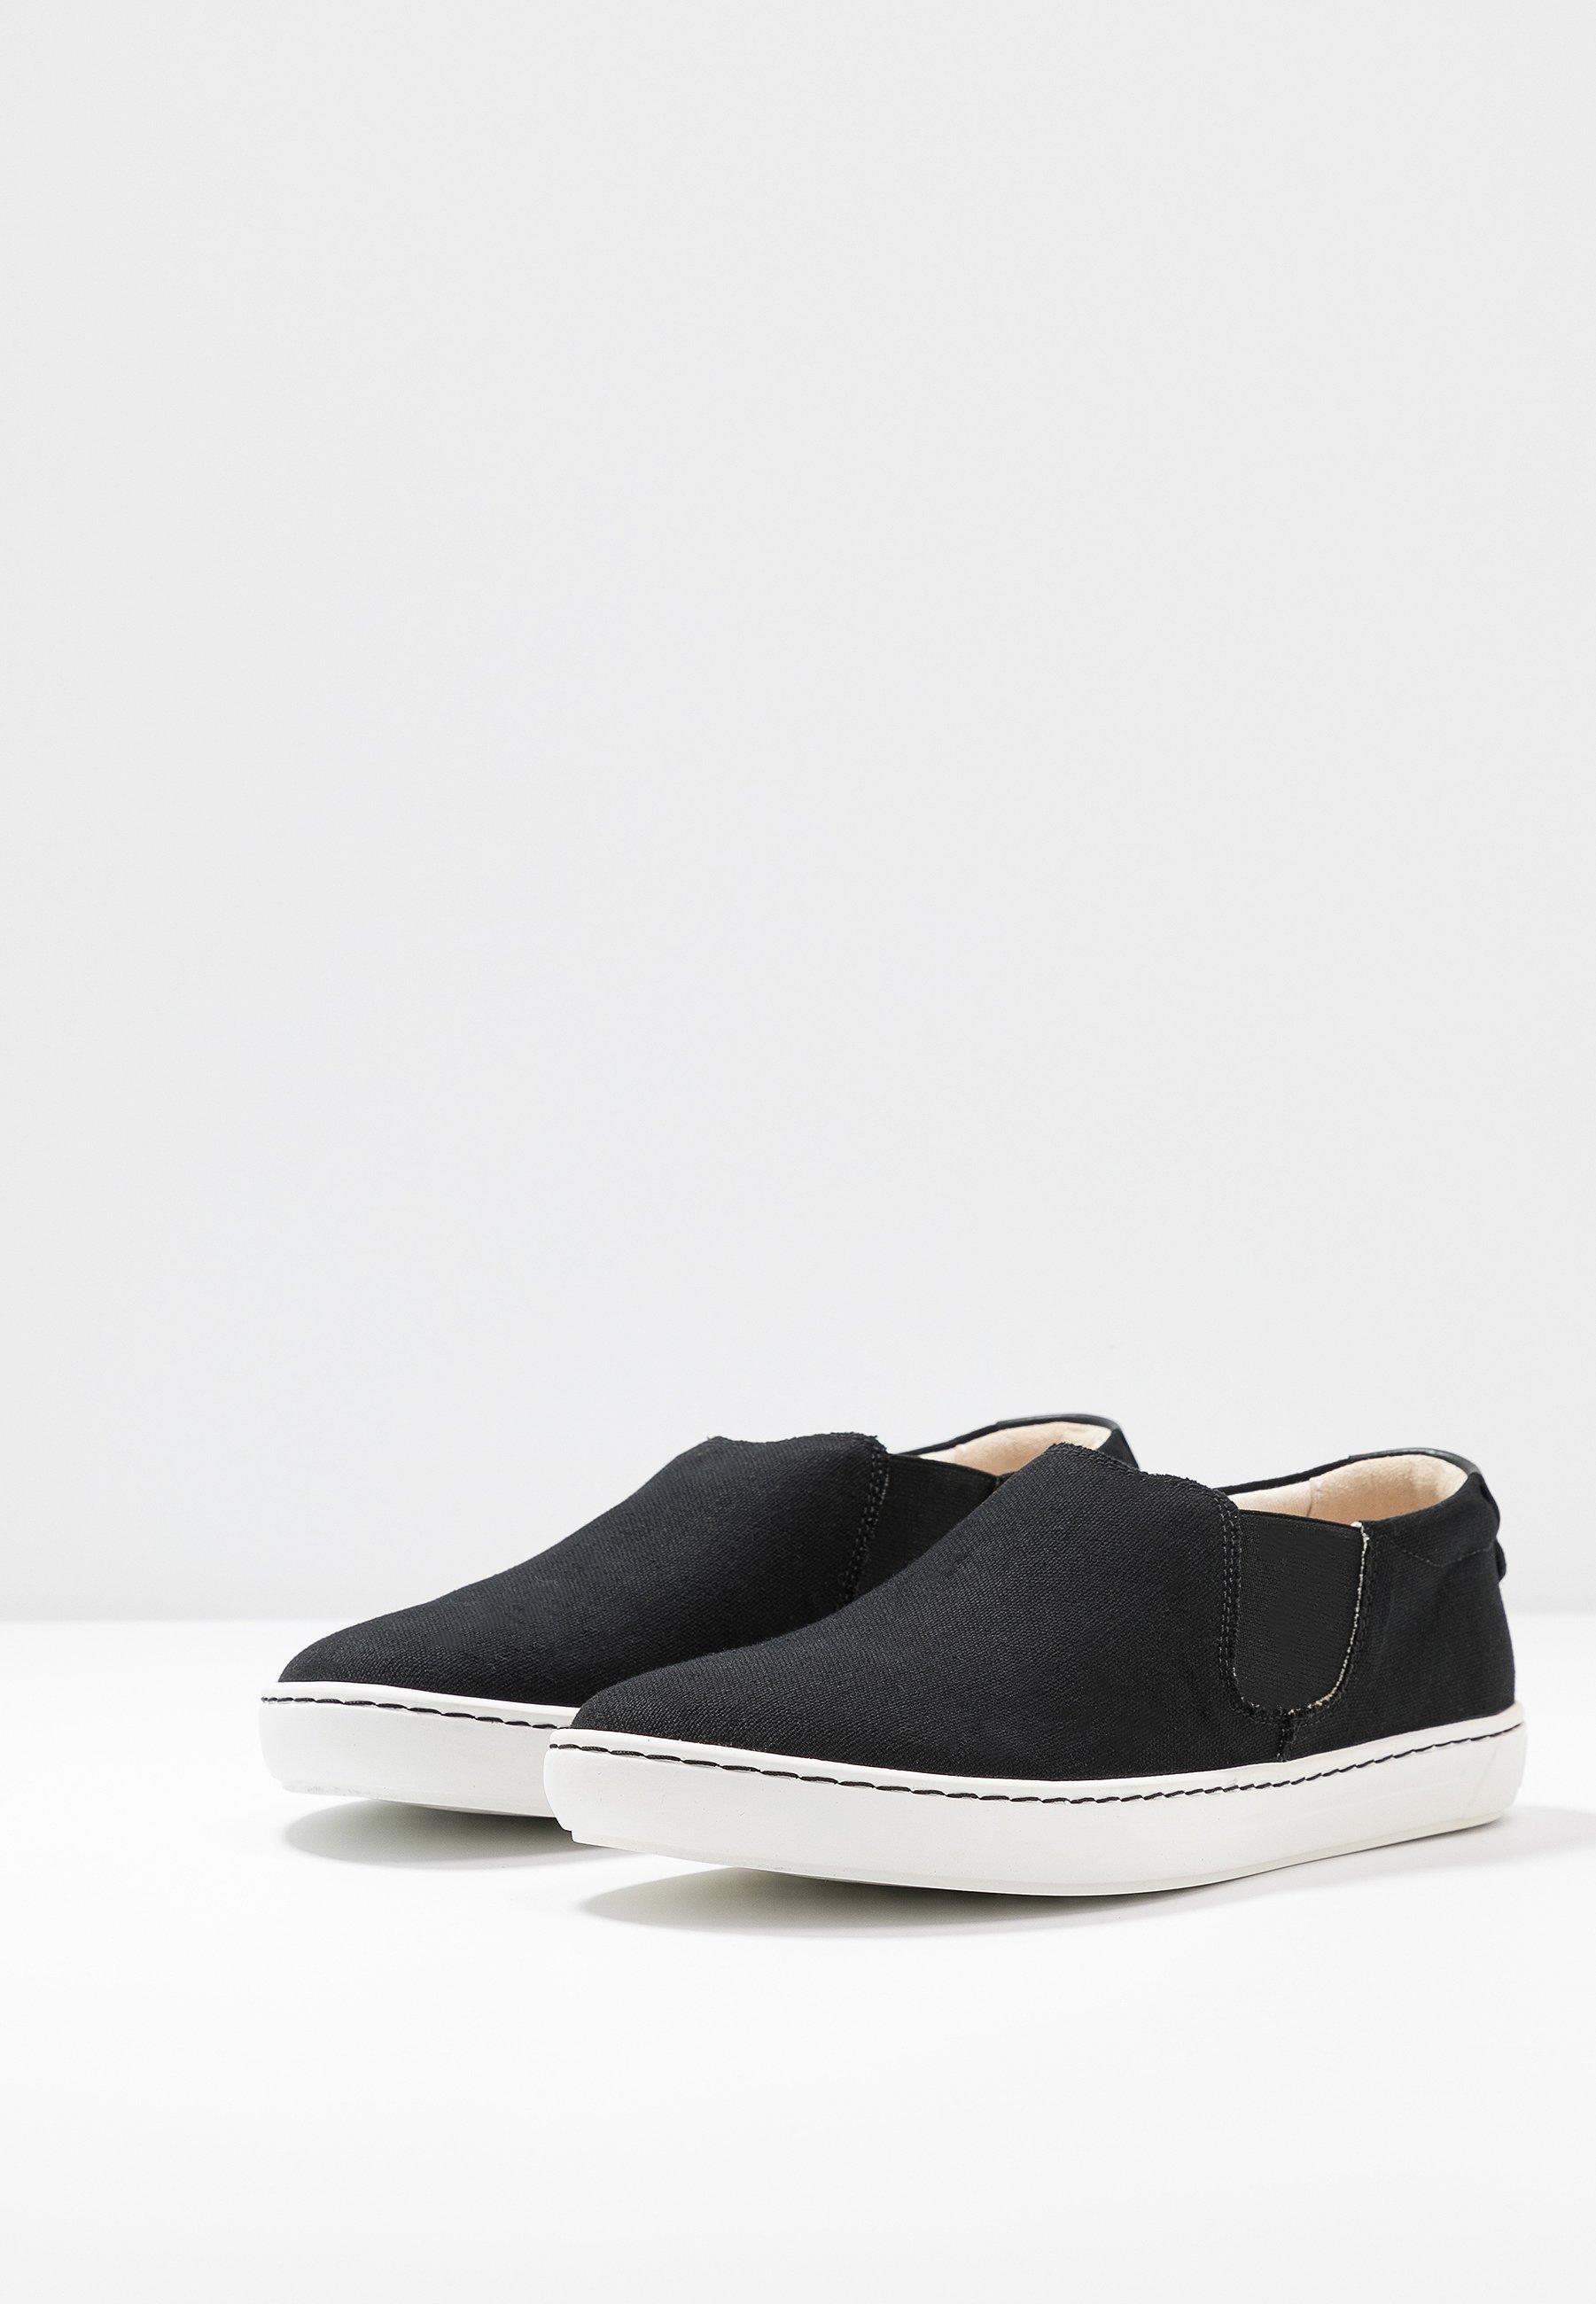 Birkenstock BARRIE - Mocassins - black - Mocassins & Chaussures bateau femme Original